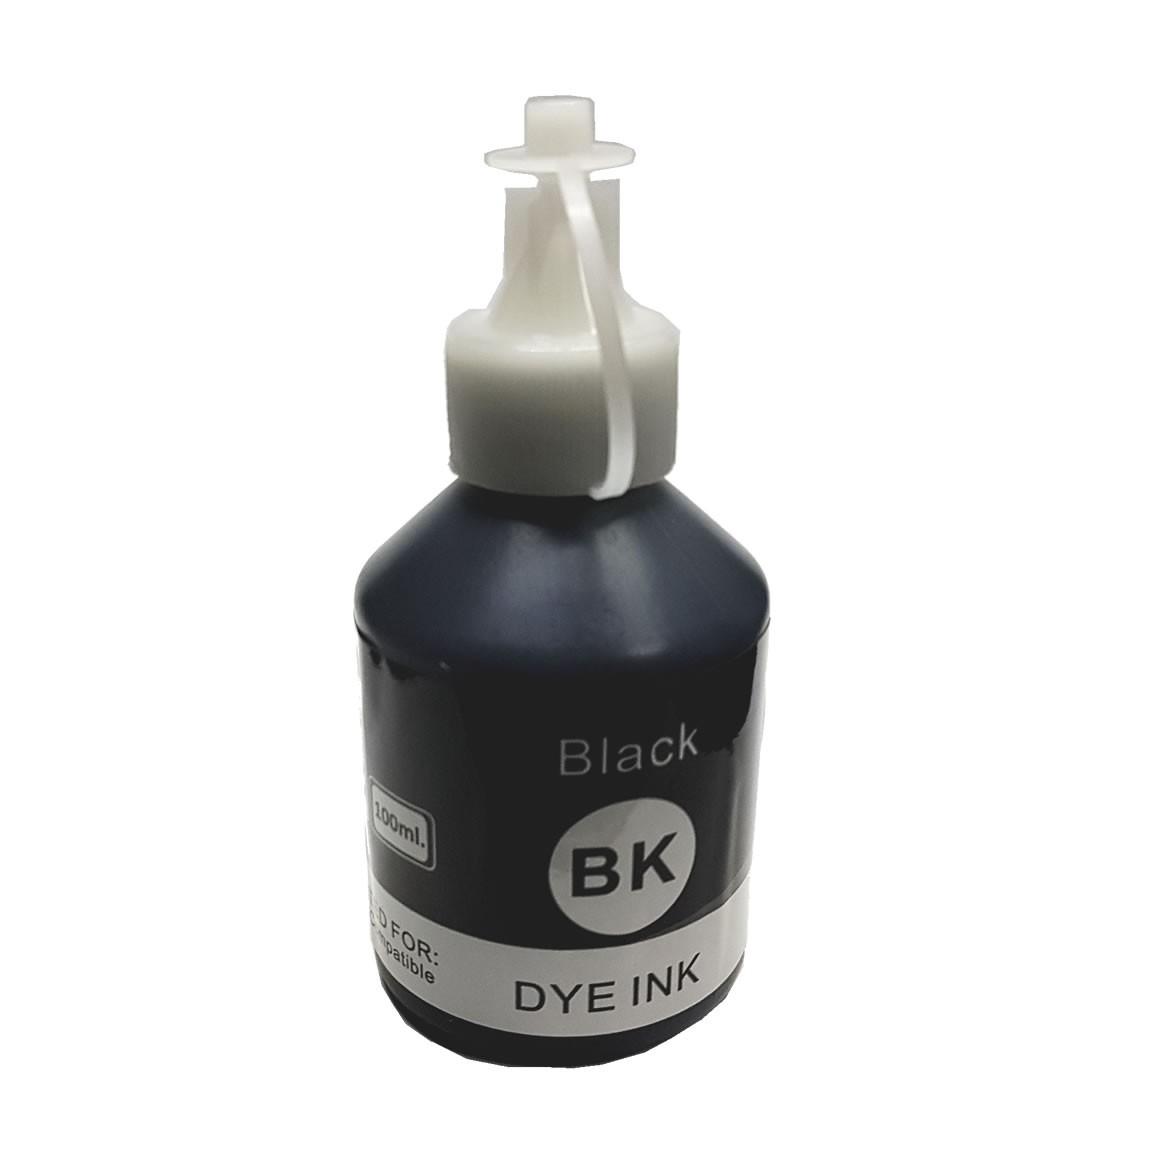 Refil de tinta BT6001Bk Preto 100ml Compatível para T300 T500W T700W T800W da Brother